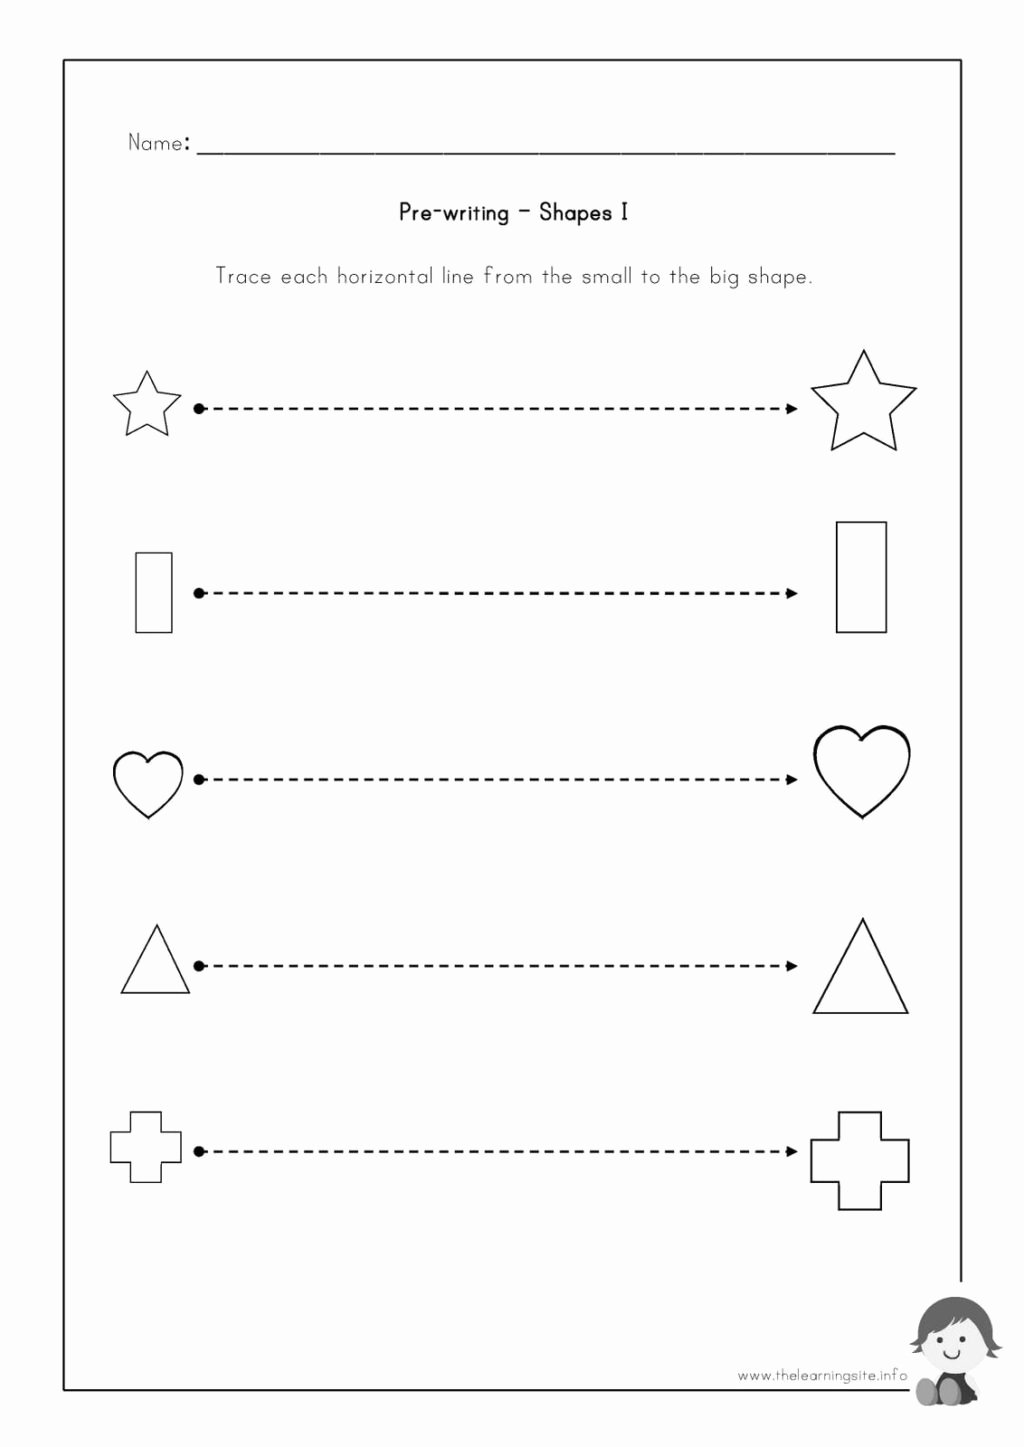 Worksheets for Preschoolers Writing Inspirational Worksheet Pre Writing Worksheets to Educations Outstanding